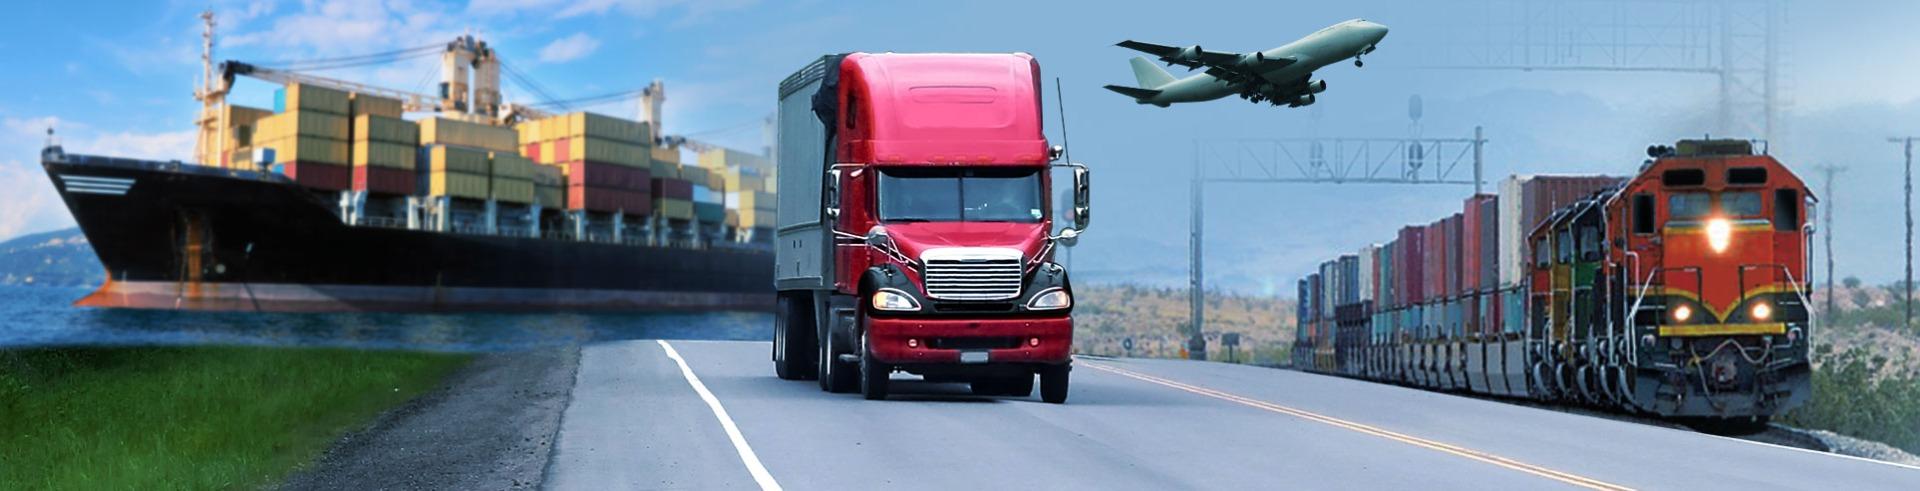 Перевозка грузов